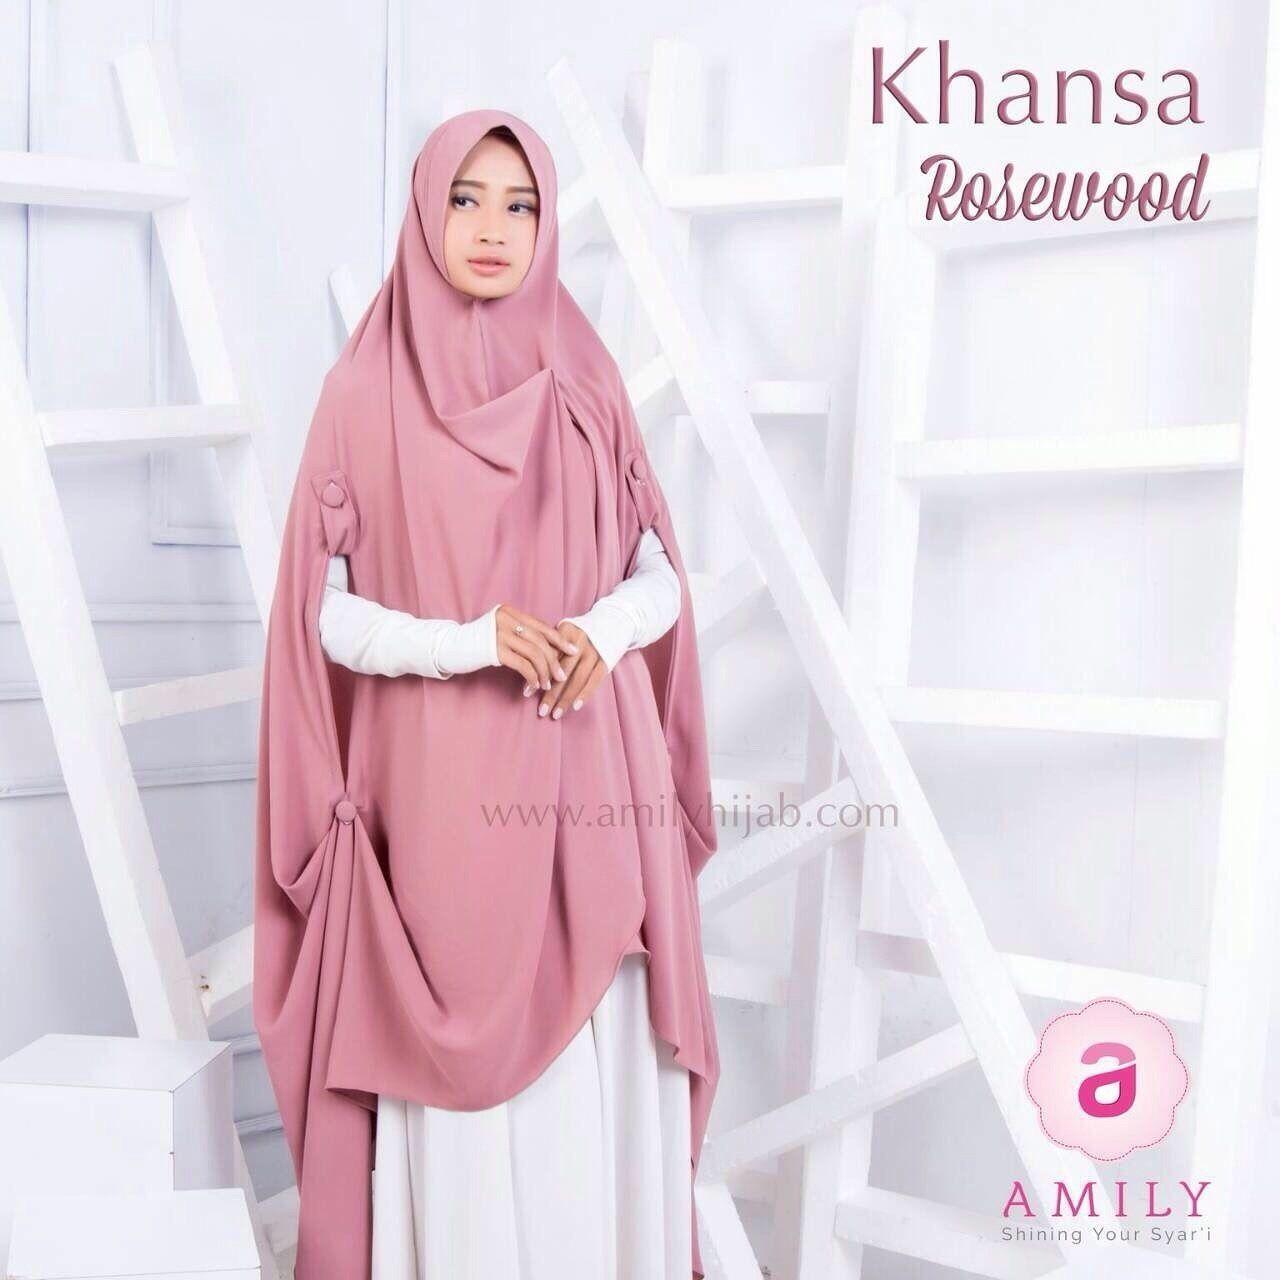 Amily Khansa Khimar Rosewood - hijab kerudung khimar jilbab syari